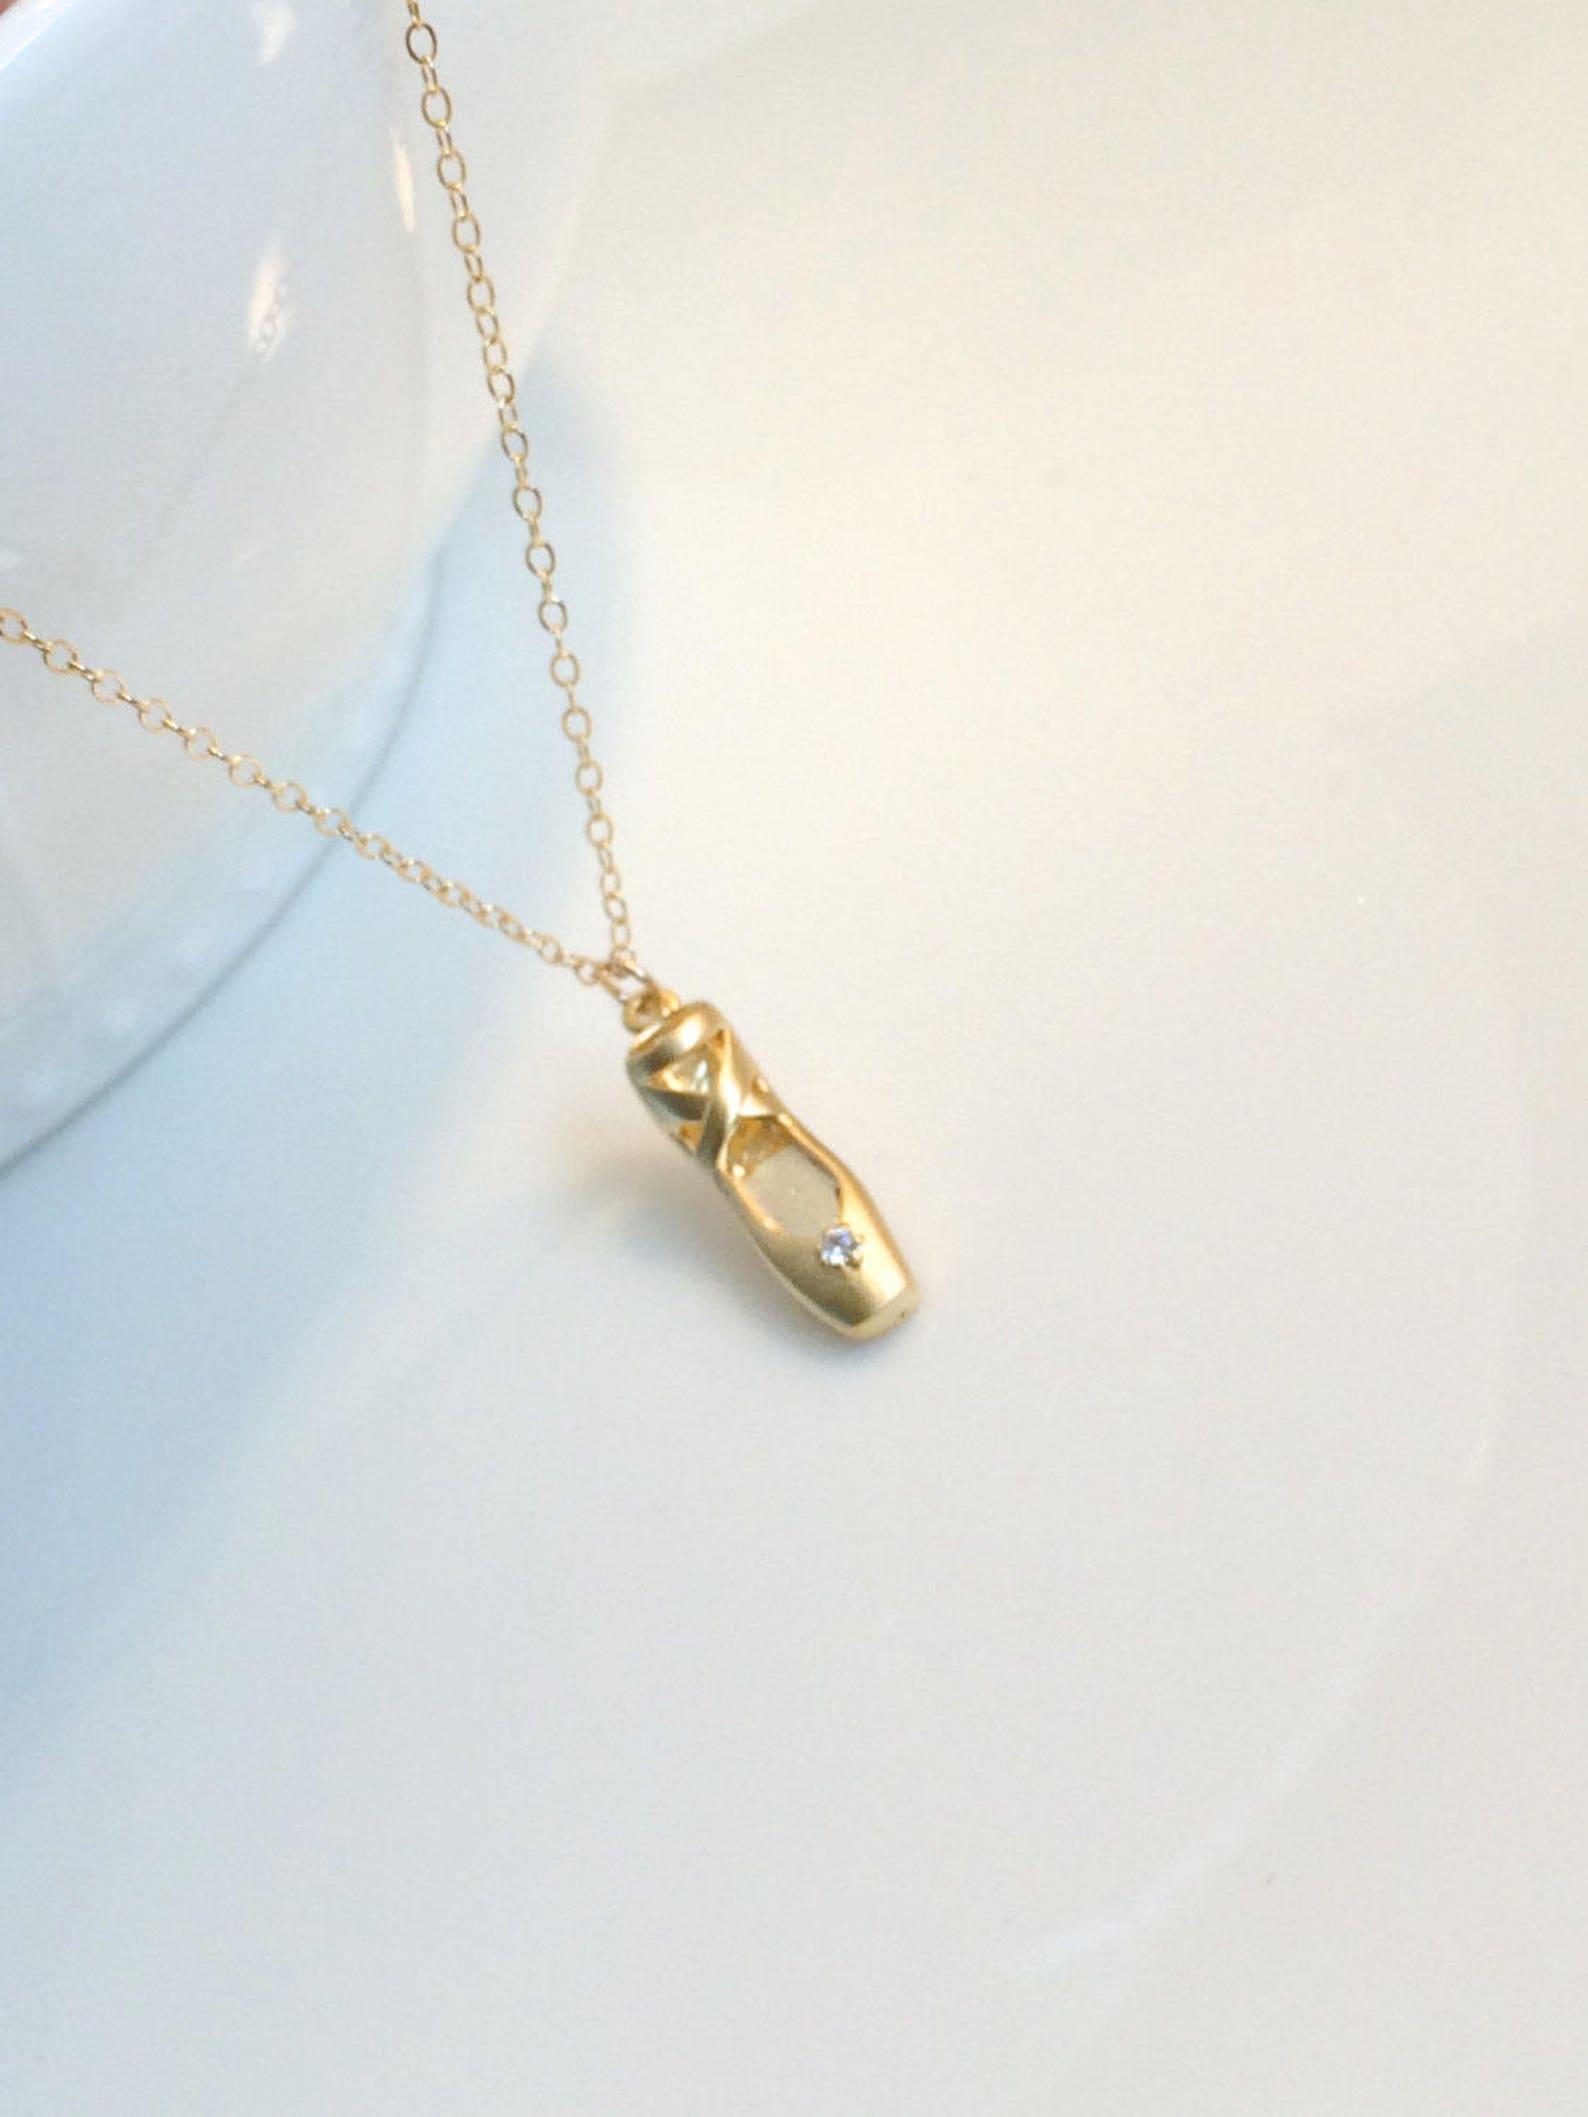 ballet shoe necklace, gold toe shoe necklace, ballerina necklace, gold ballet slipper necklace, silver ballet slipper, little gi